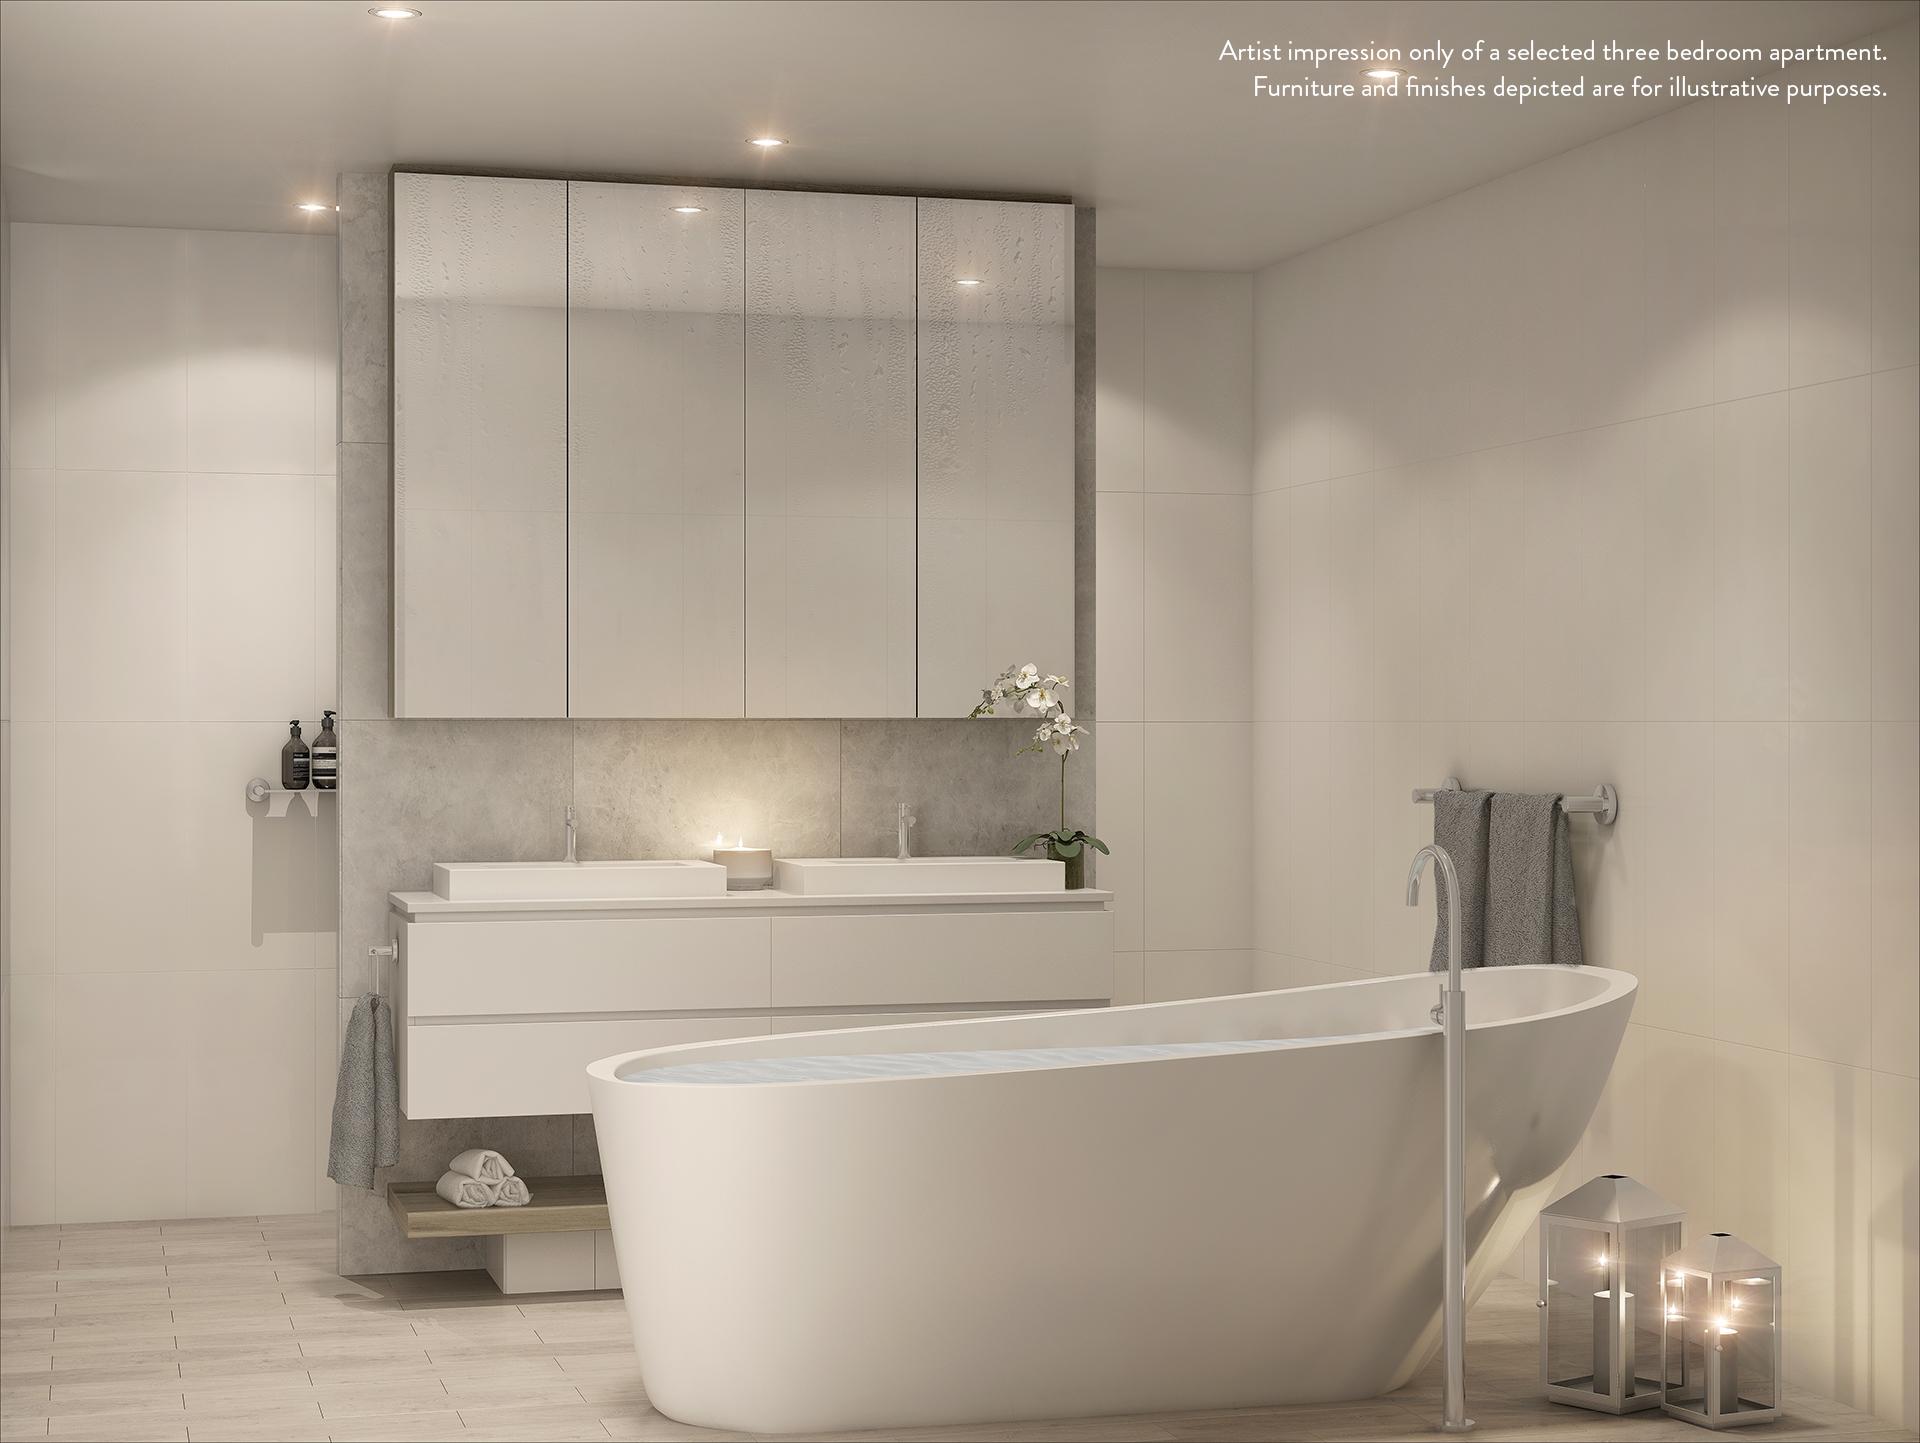 GH_C06(Bathroom)_Disclaimer (1)